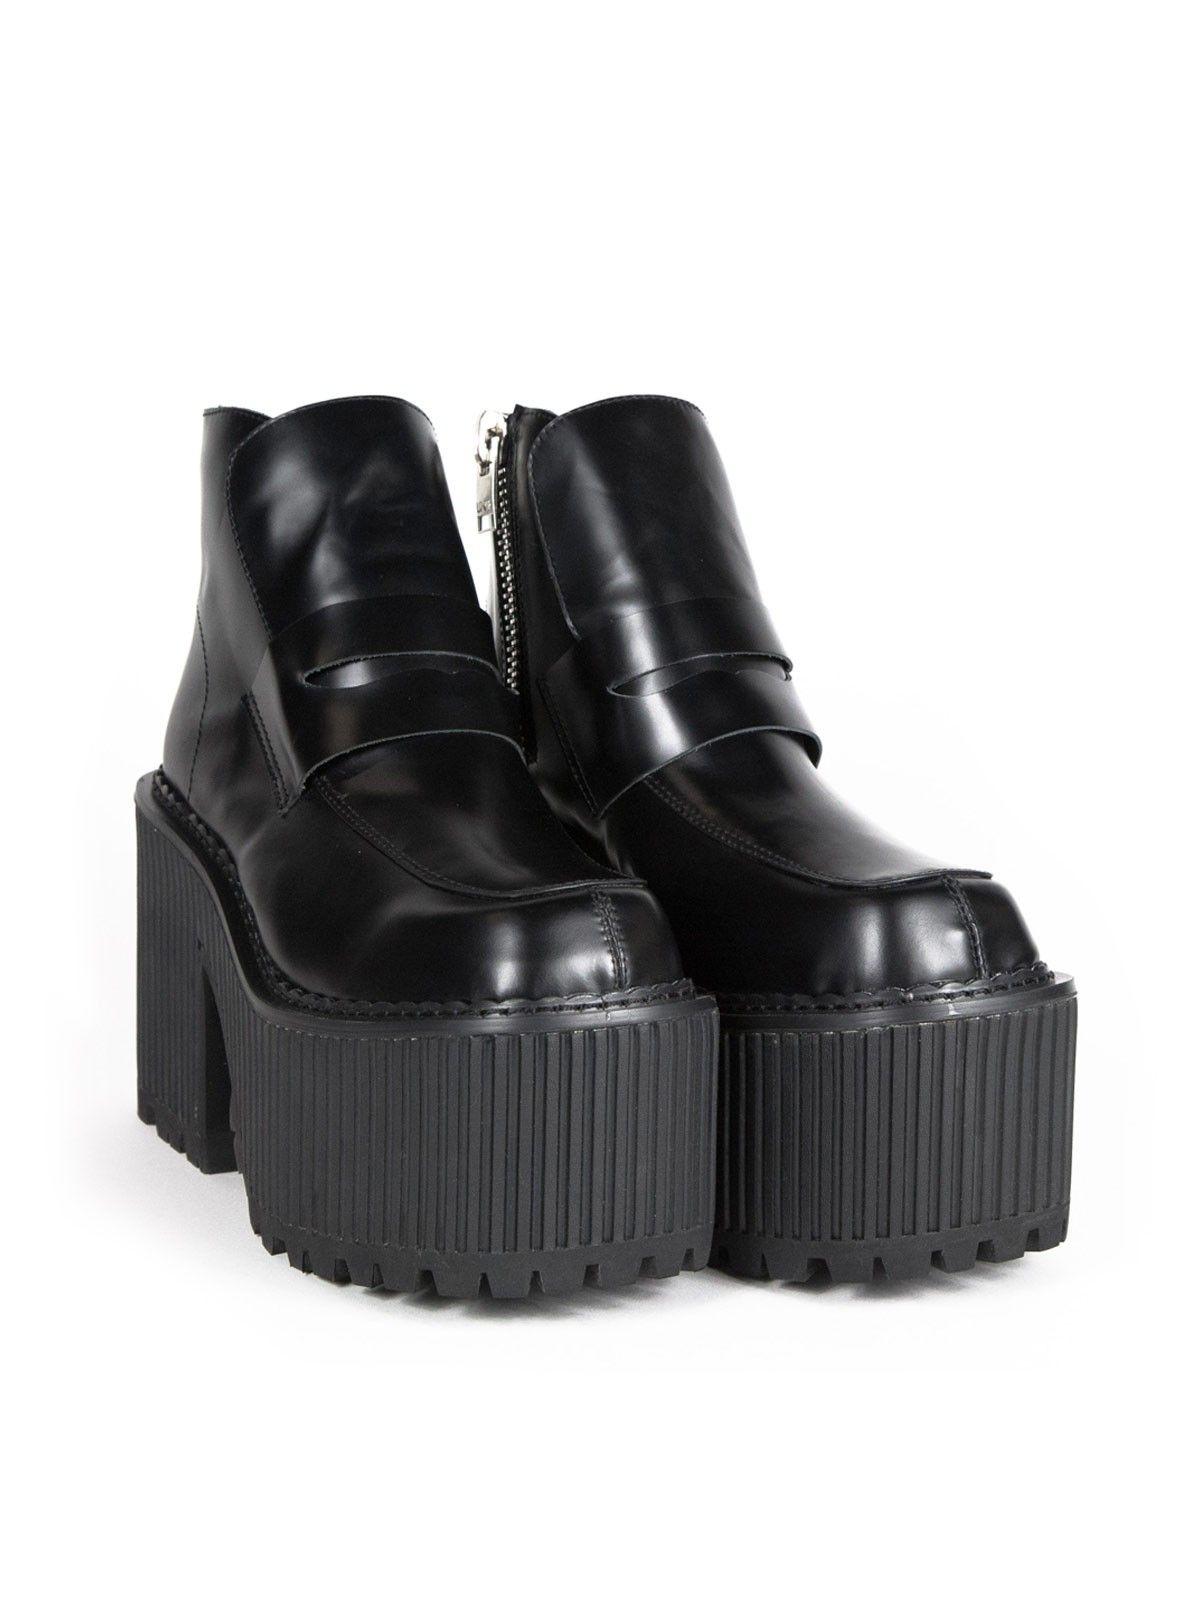 36e4cbe1d1c Black Booties · Oh good